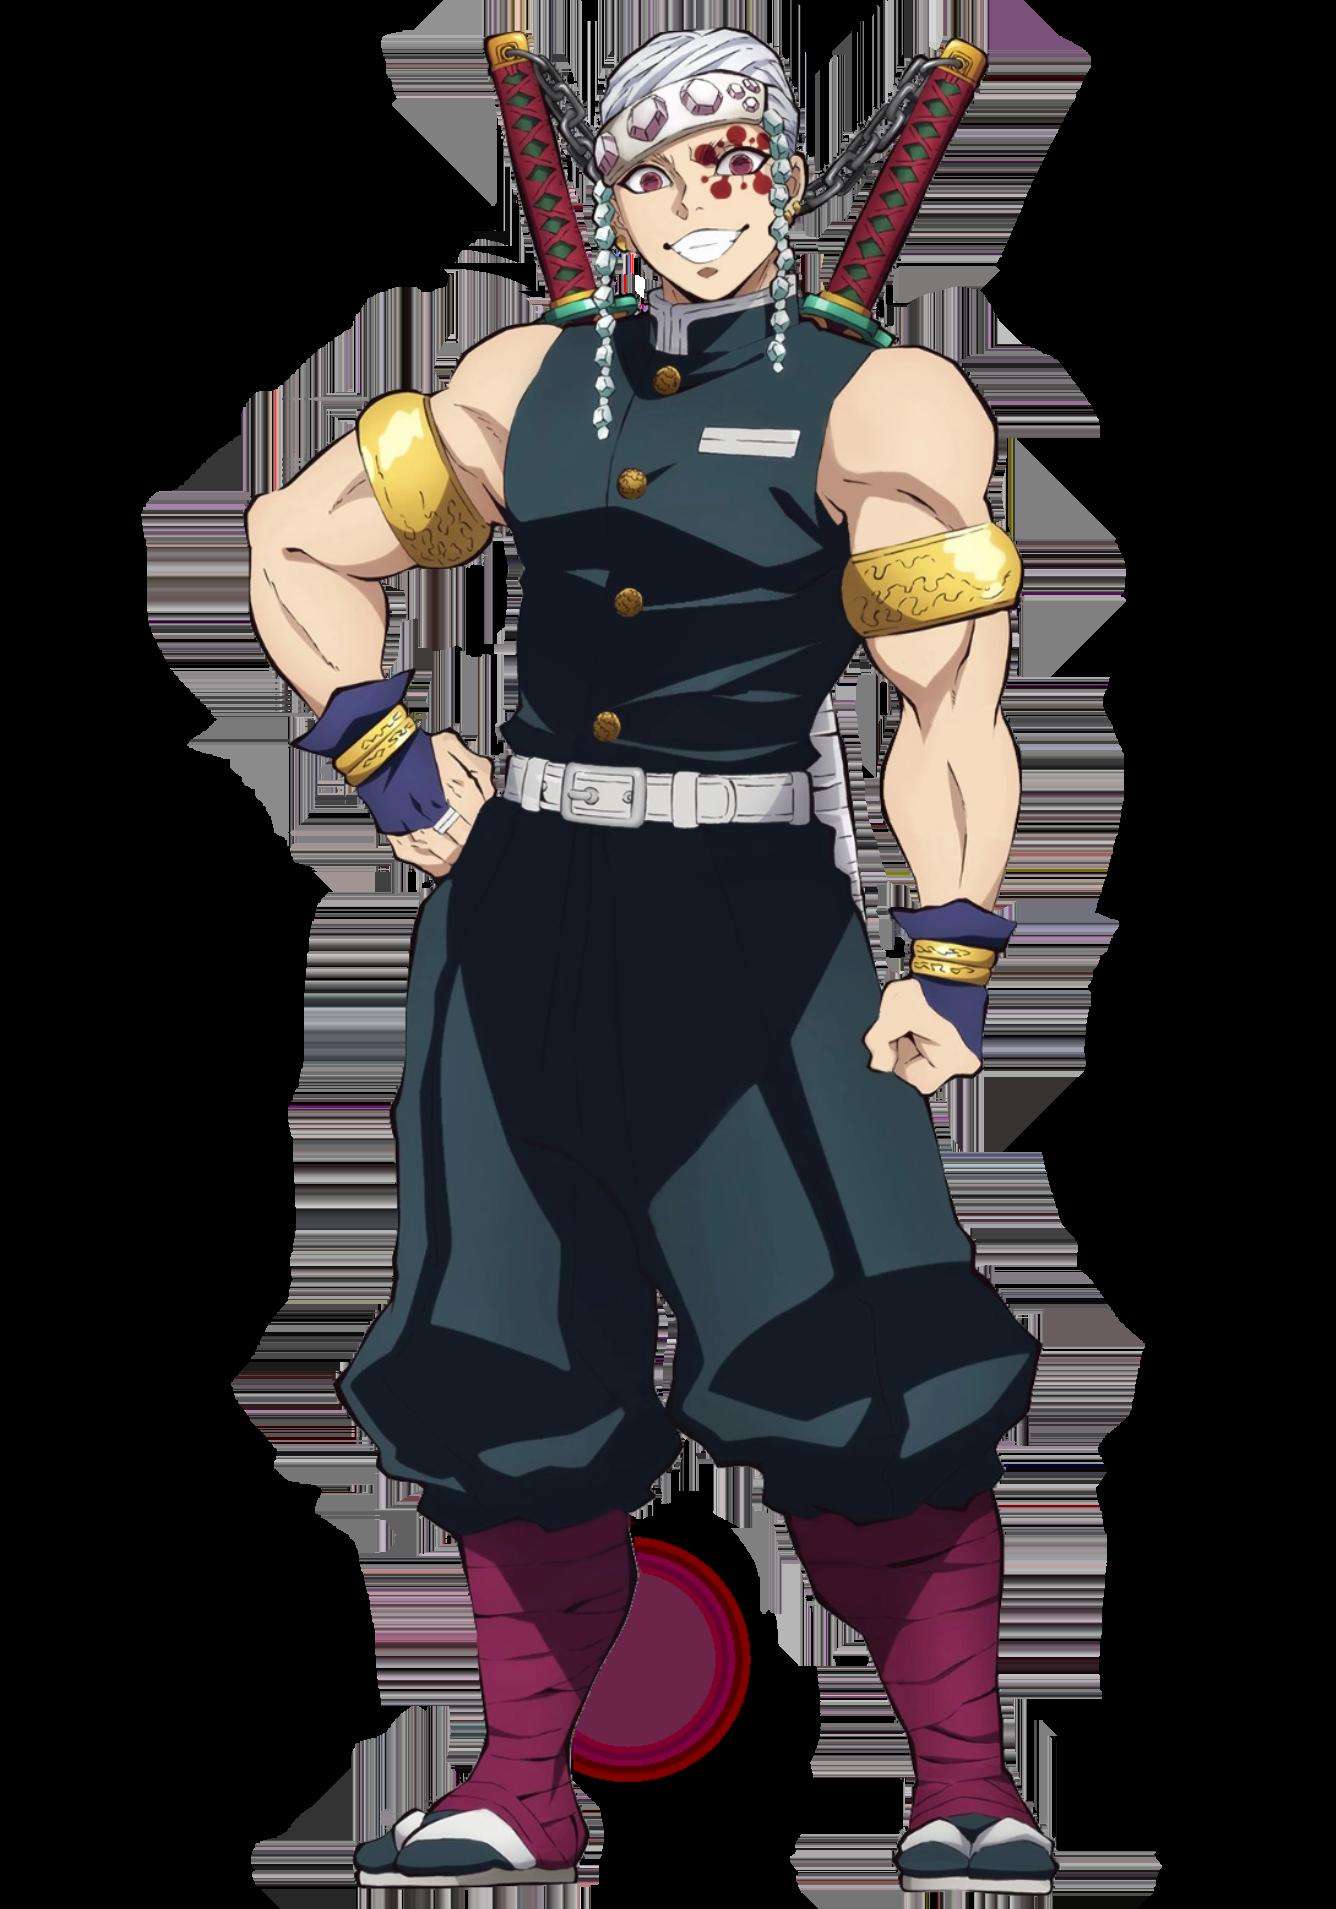 Tengen Uzui Kimetsu No Yaiba Wikia Fandom Anime Demon Slayer Anime Anime Characters